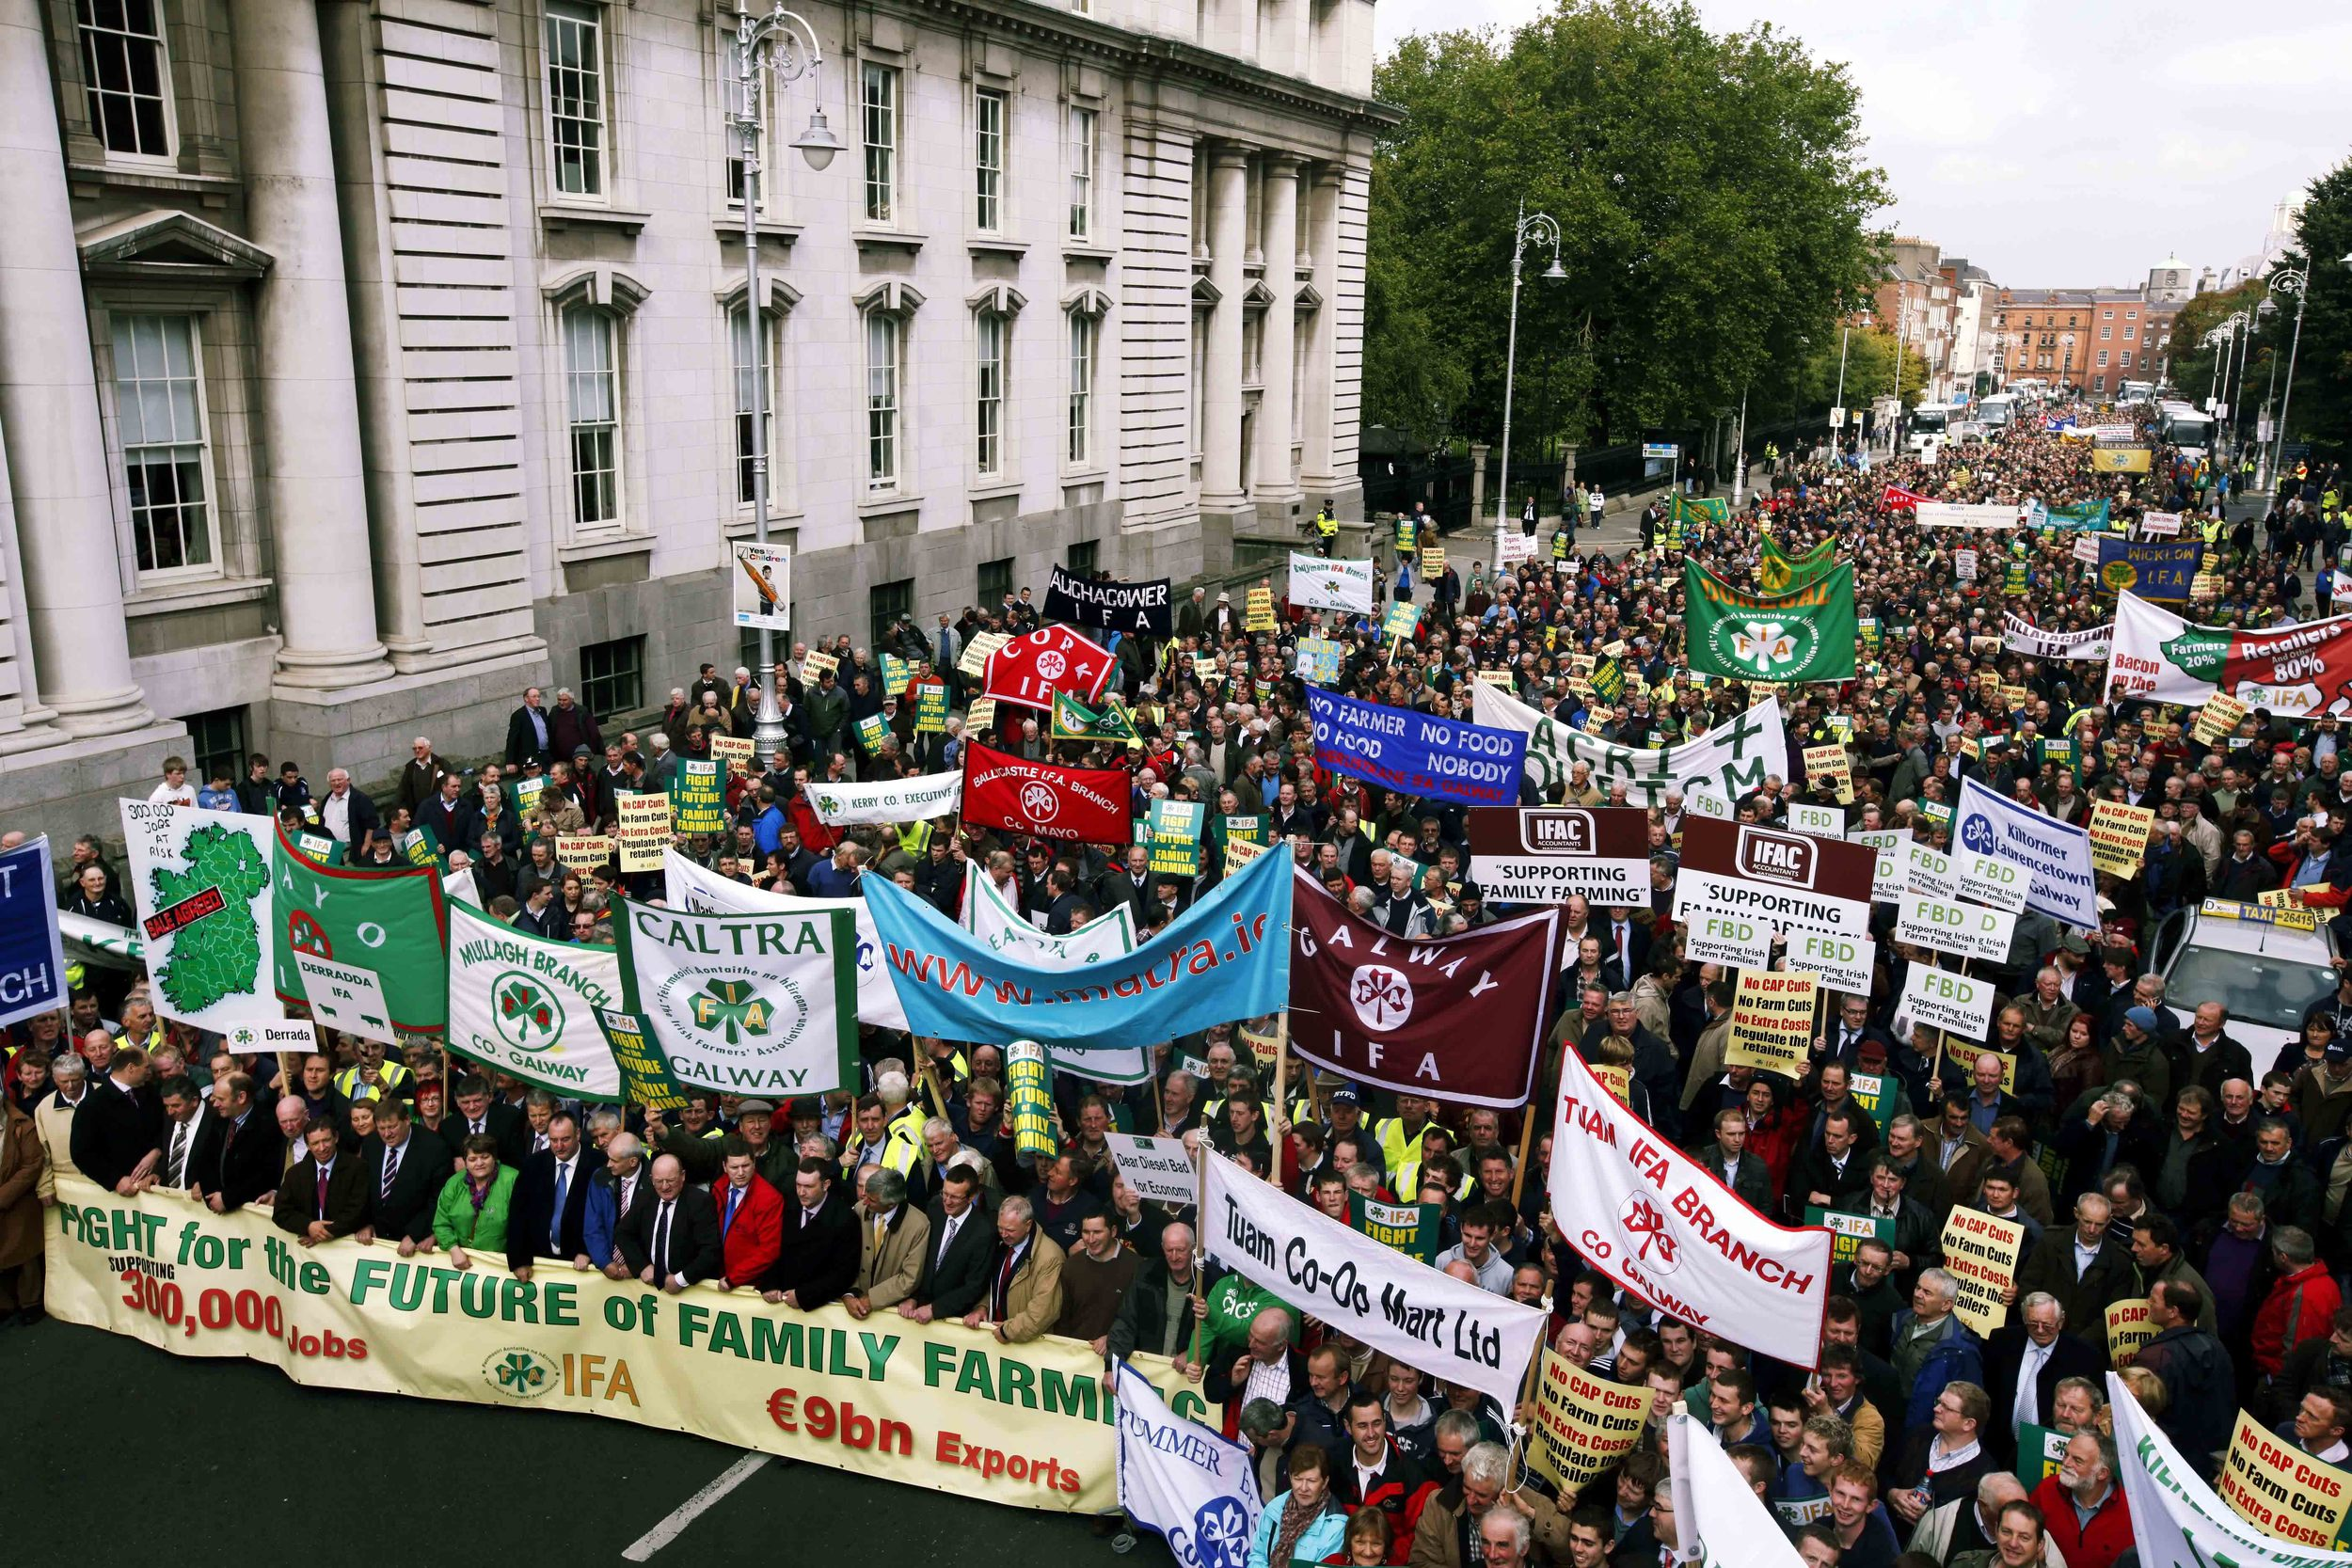 30,000 (IFA) Irish Farmers Associations Members protest in Dublin.